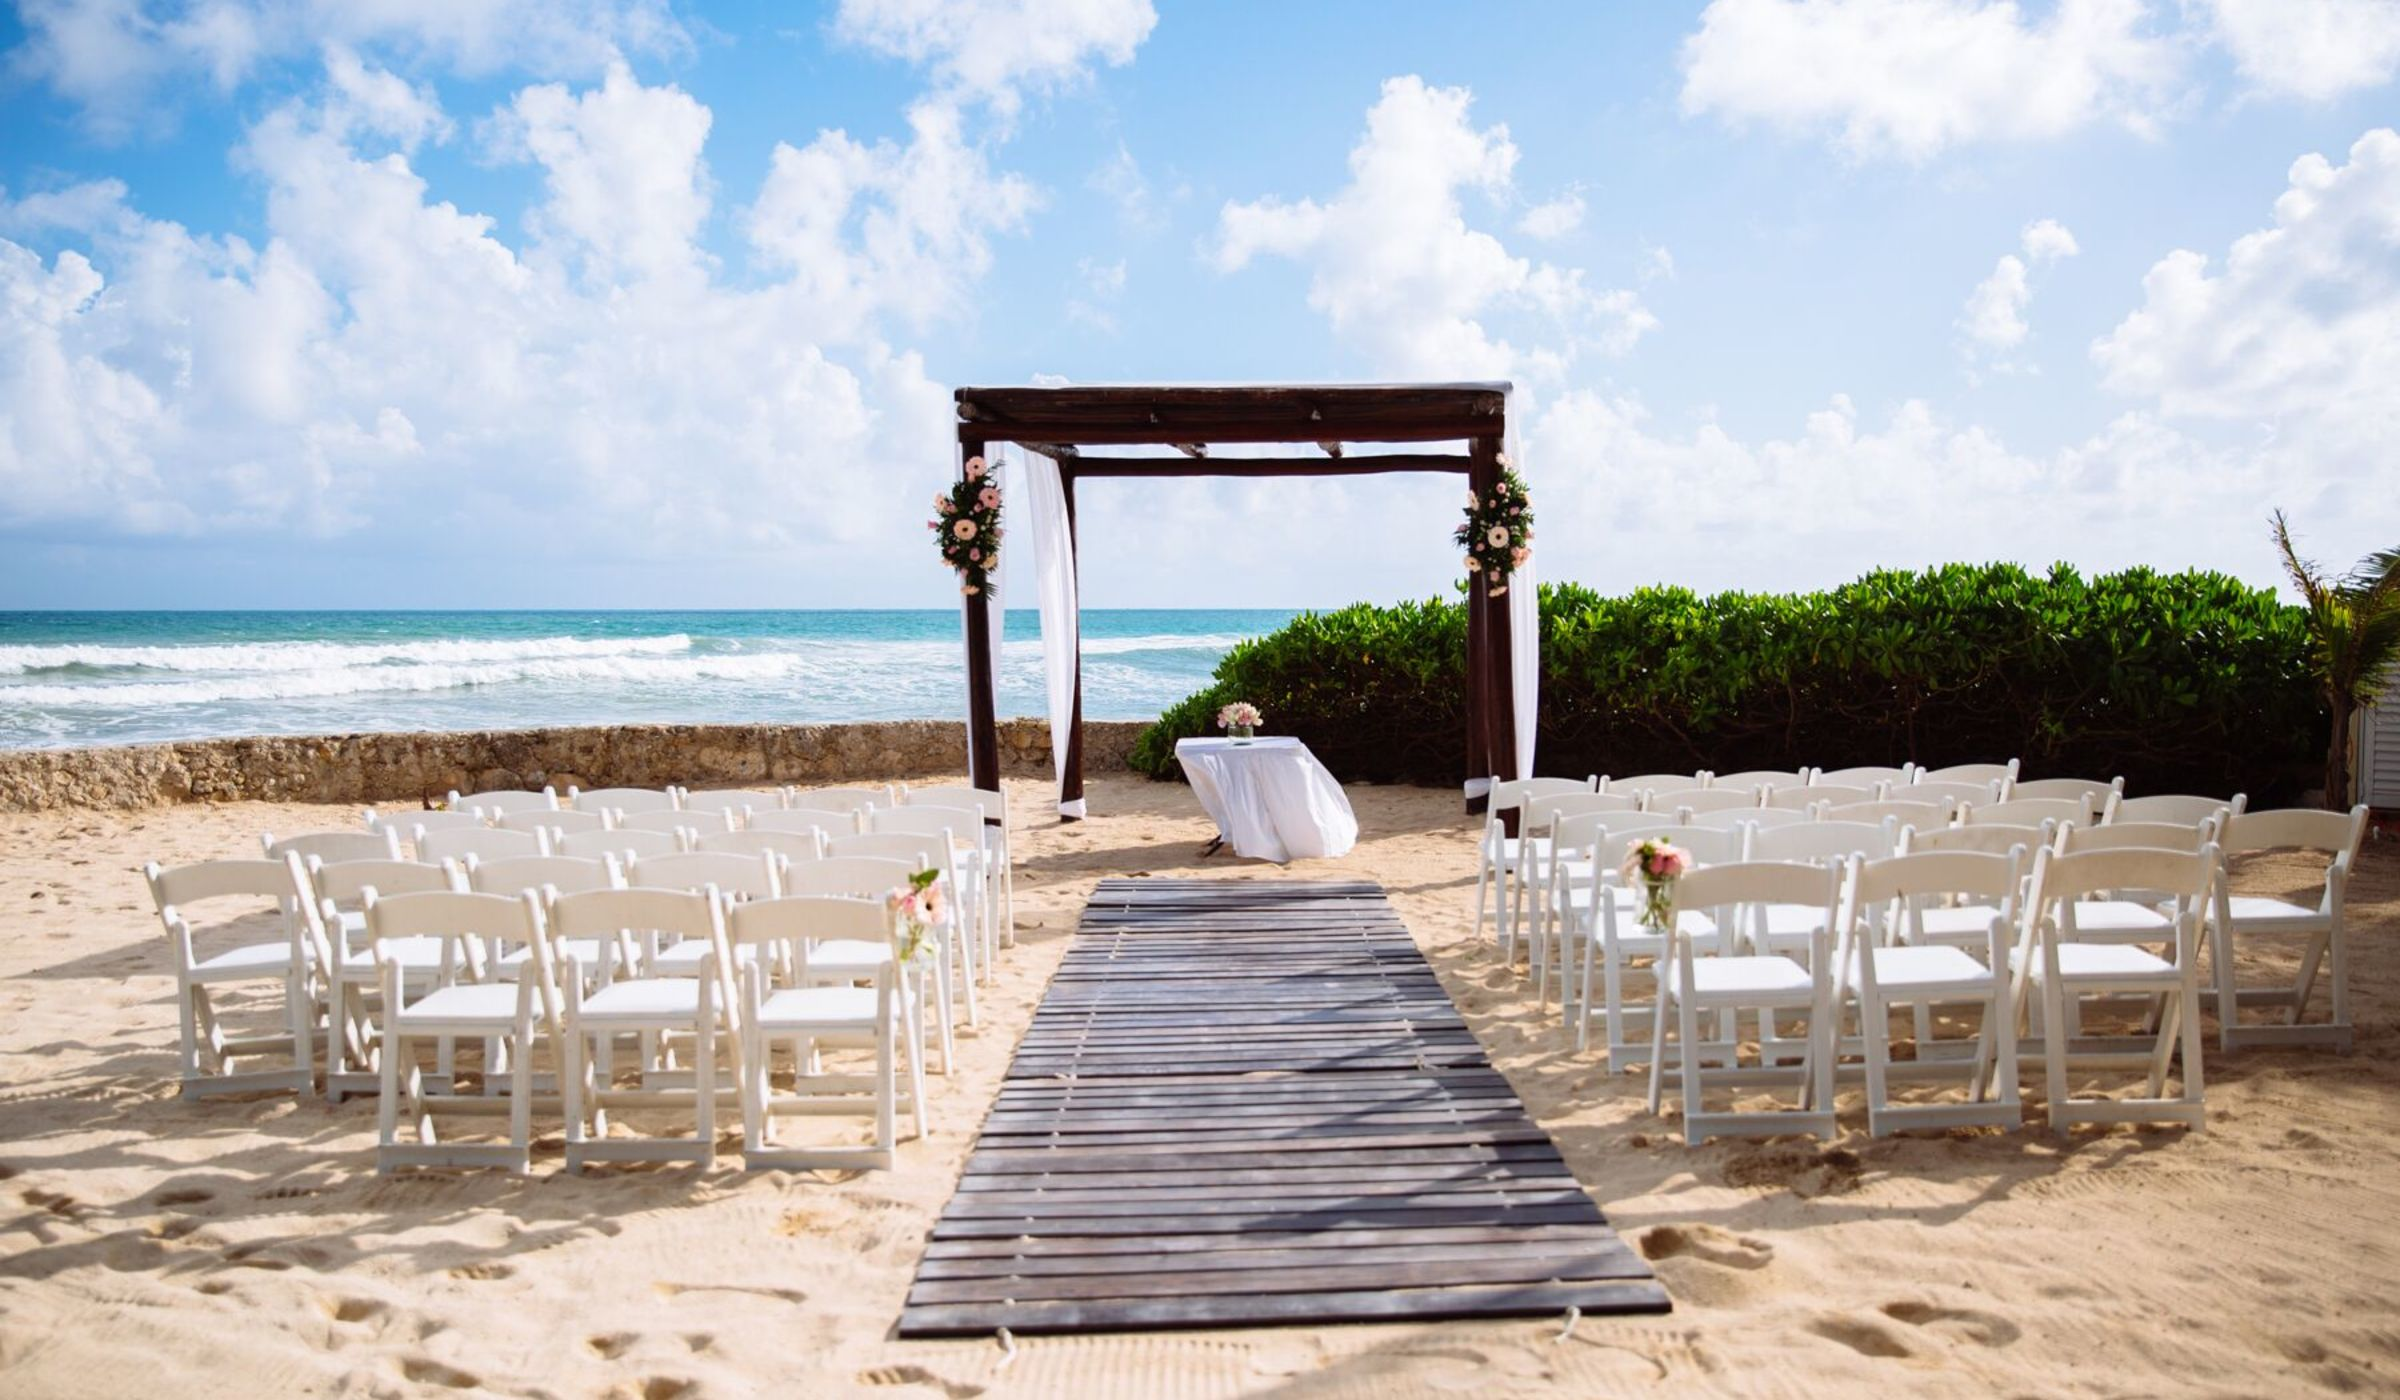 Destination weddings weddingwire beach destination wedding ideas destination weddings junglespirit Image collections